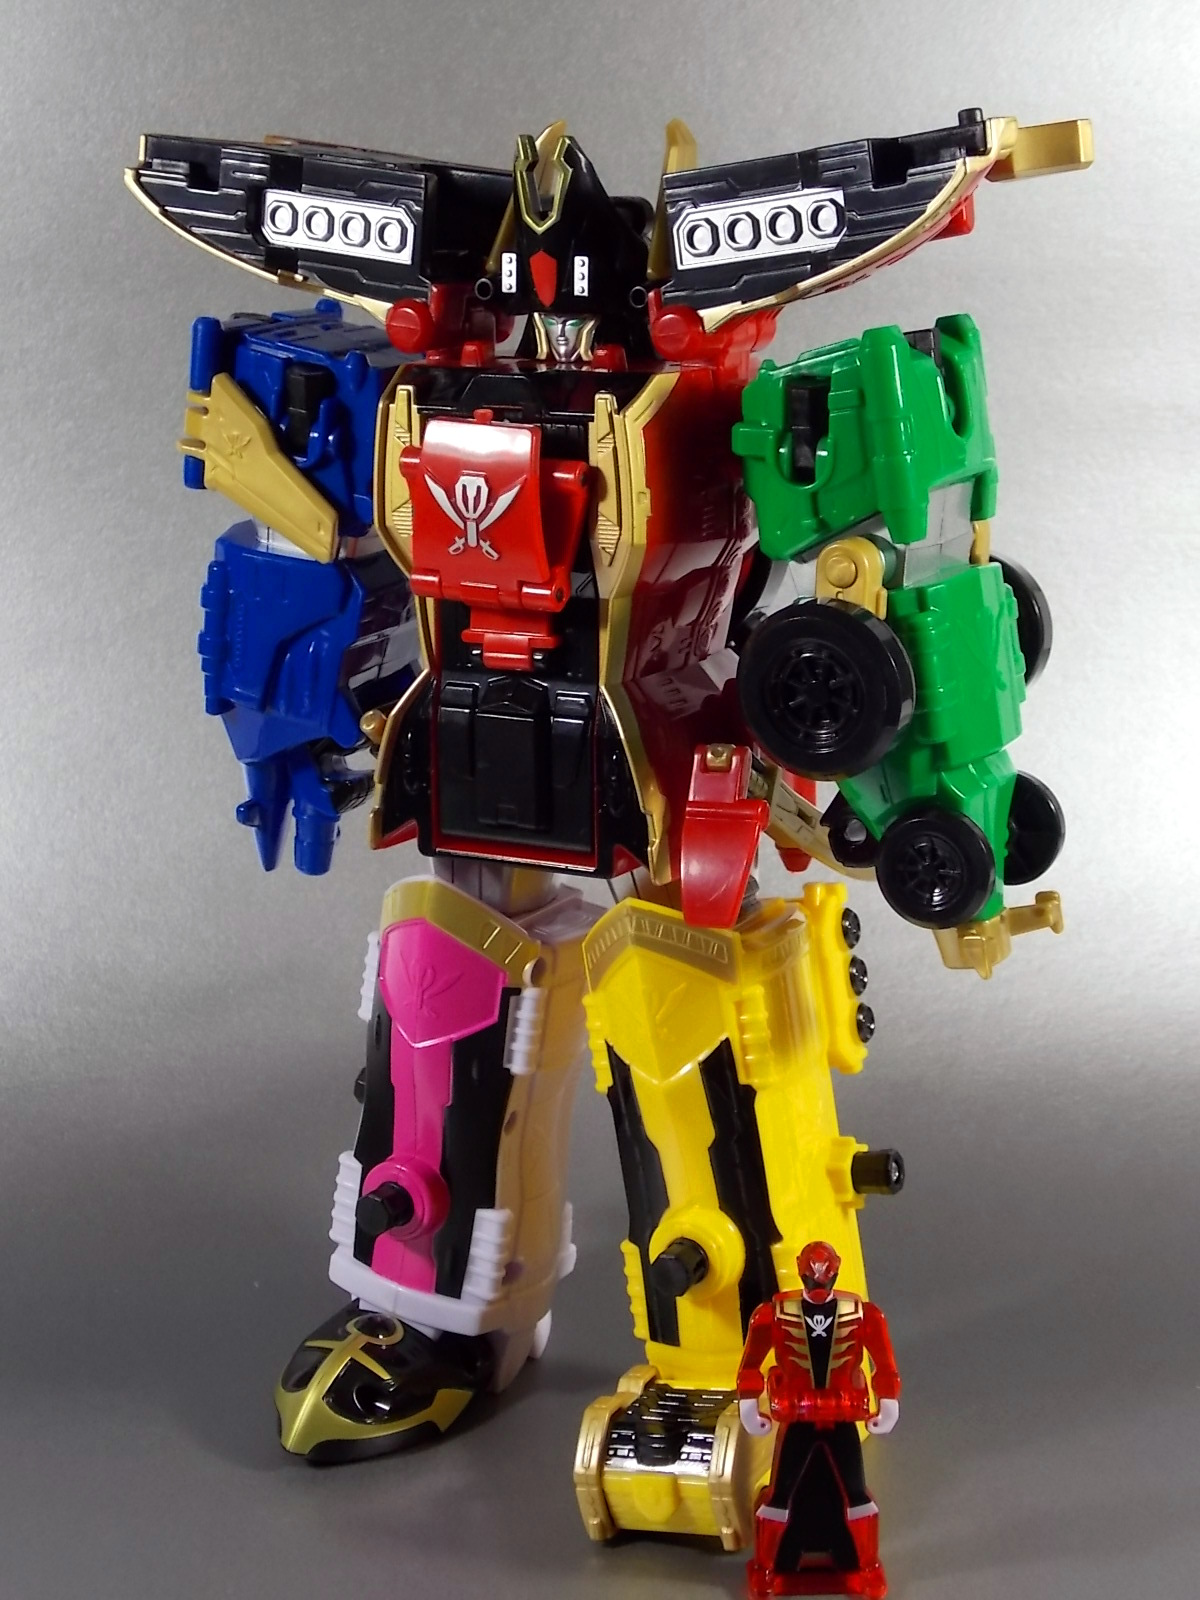 Wild Force Legendary Ranger Key Pack Red//Black//Blue Bandai 38256 Power Rangers Super Megaforce